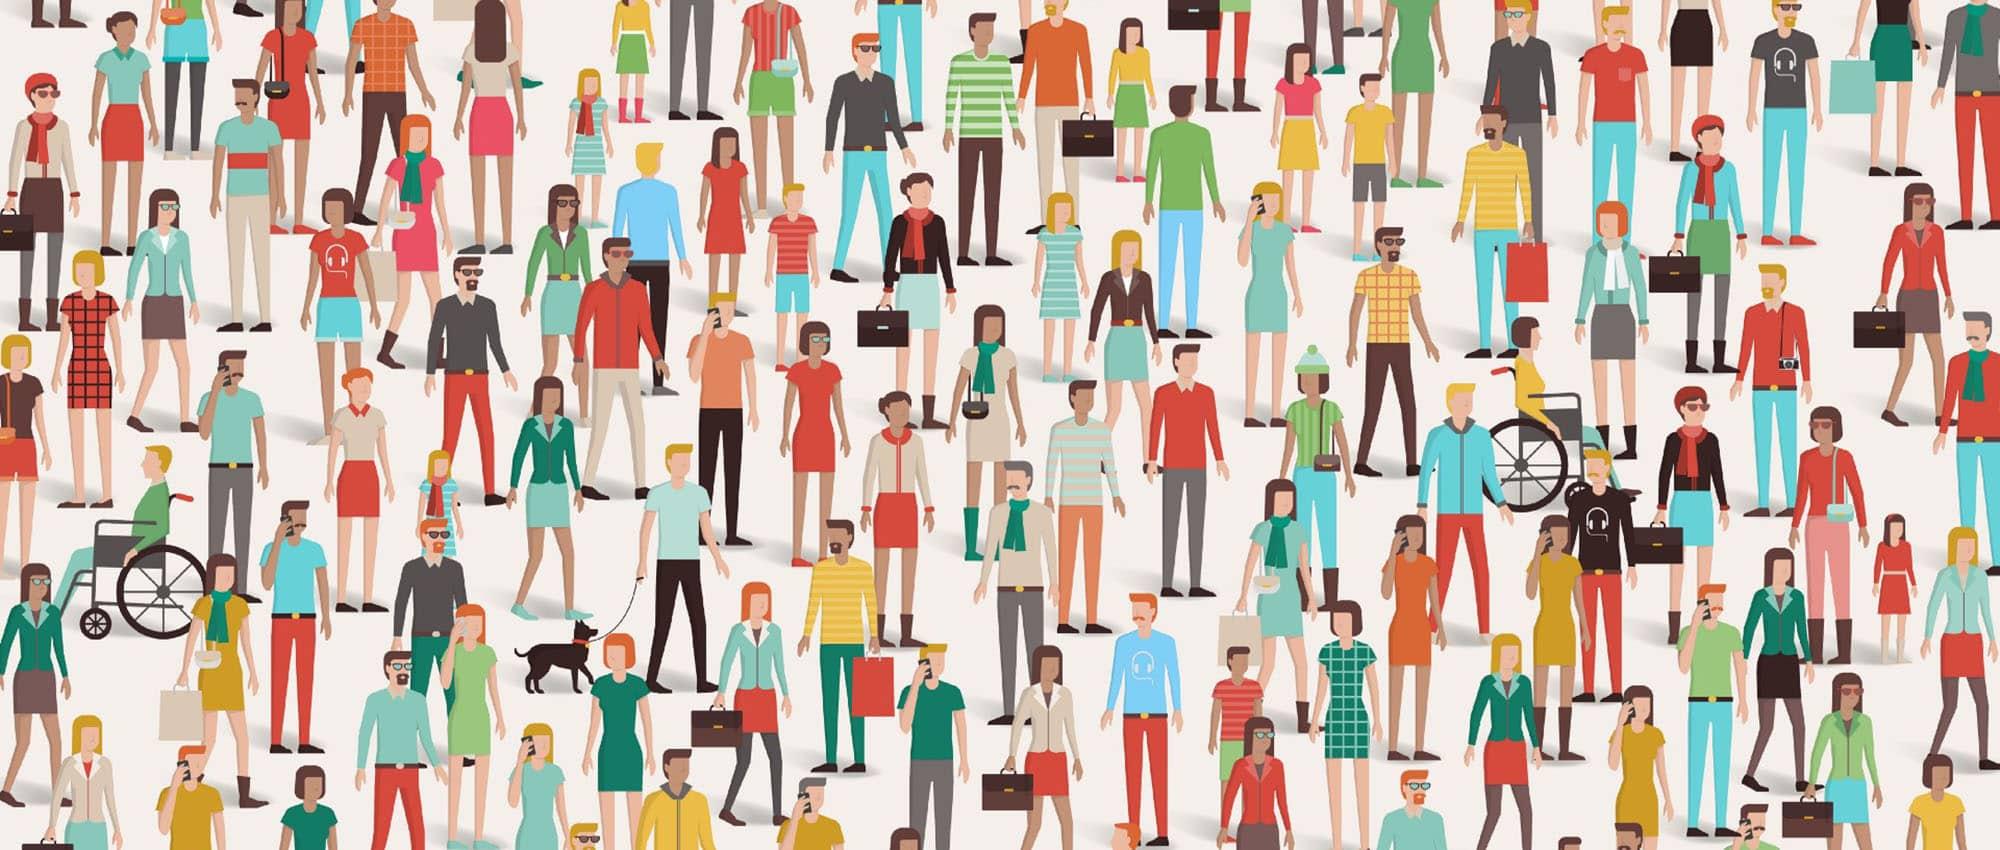 Austin Demographics Illustration